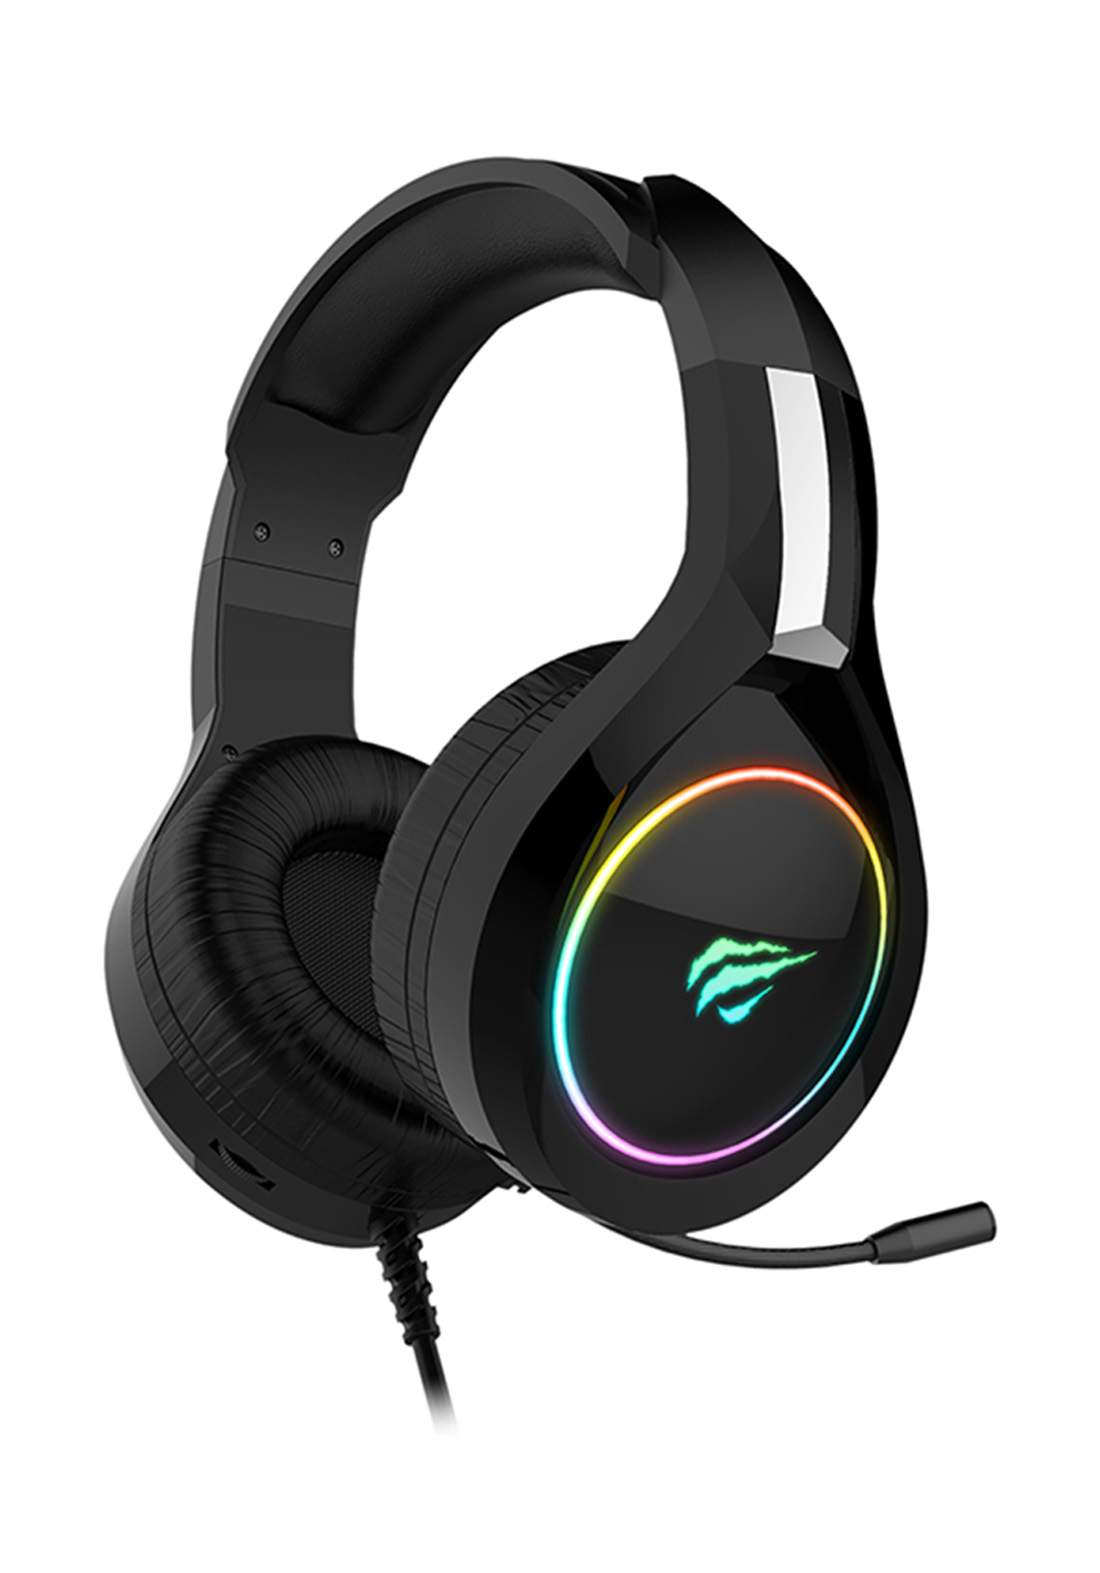 Havit HV-H2232d Gaming Headset - Black سماعة